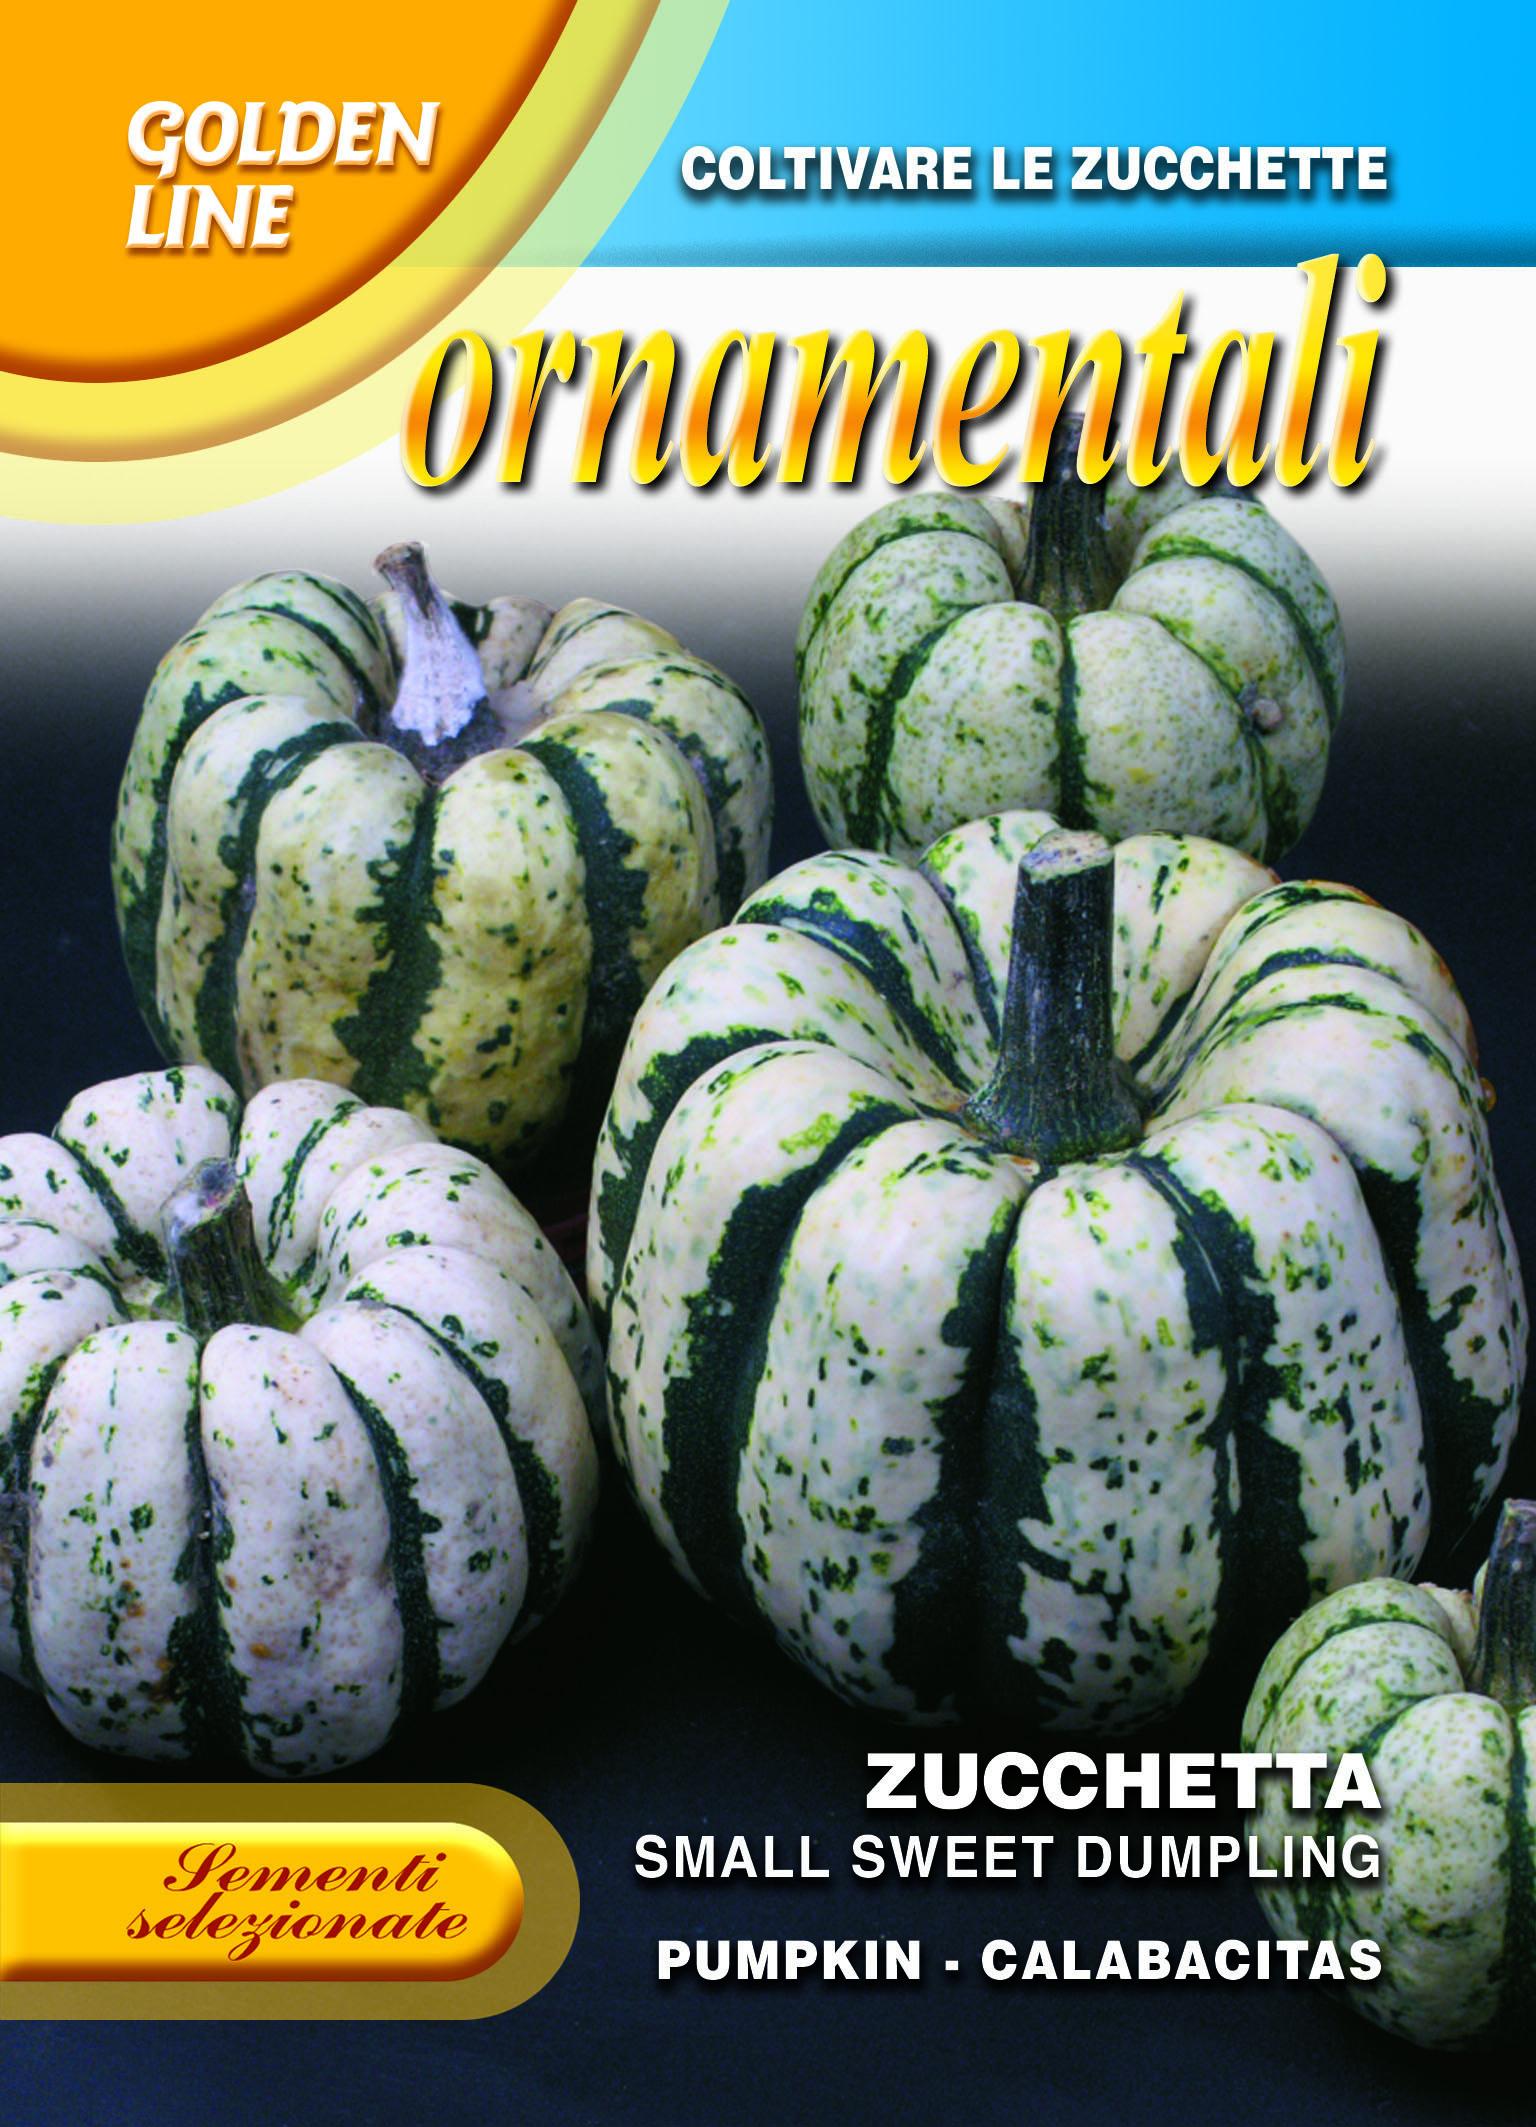 Small Sweet Dumpling Pumpkin Edible